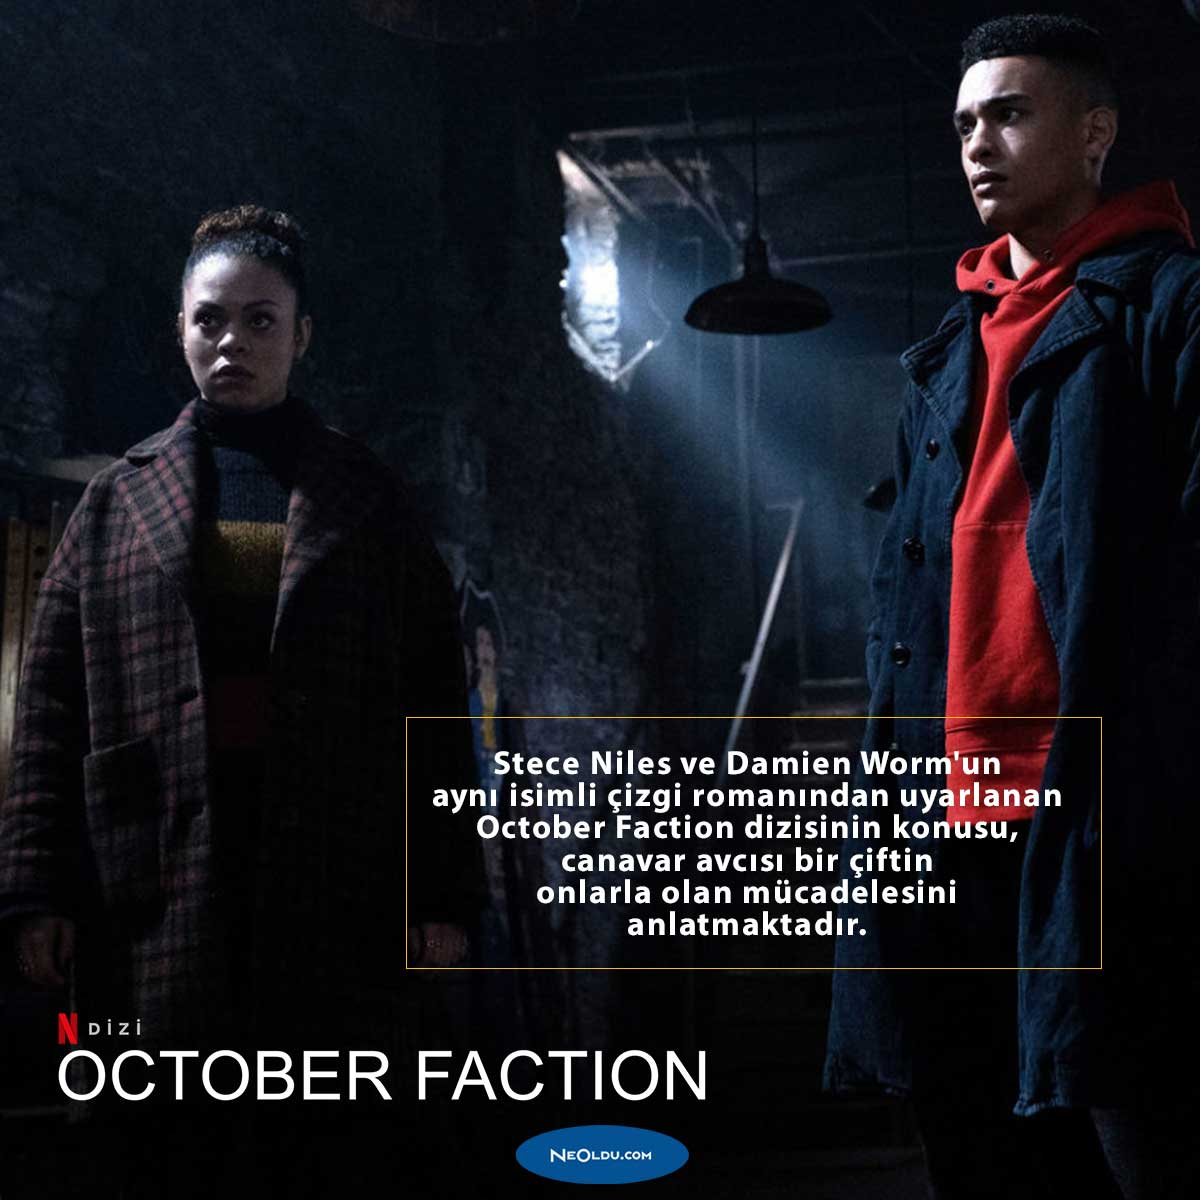 October Faction Dizisi